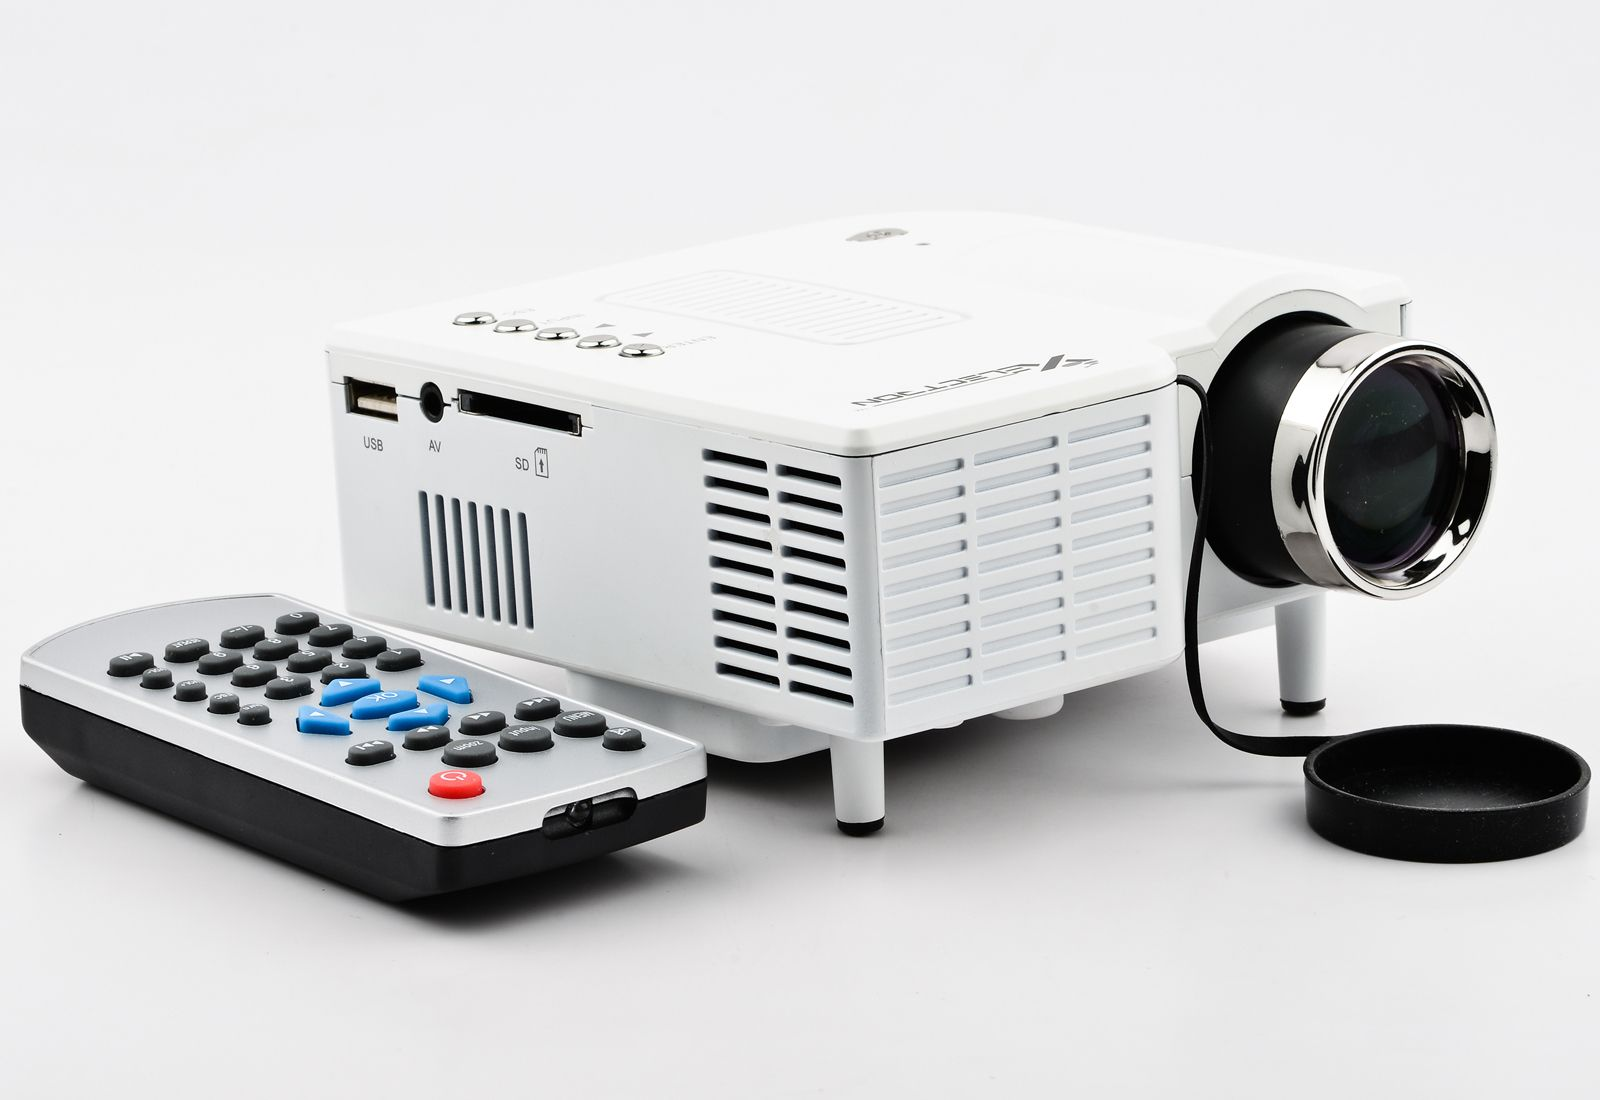 #XElectron XP-28 #LED #CinemaProjector /www.tradus.com/xelectron-xp-28-led-cinema-projector/p/PRJMSR2A0EER9YGA